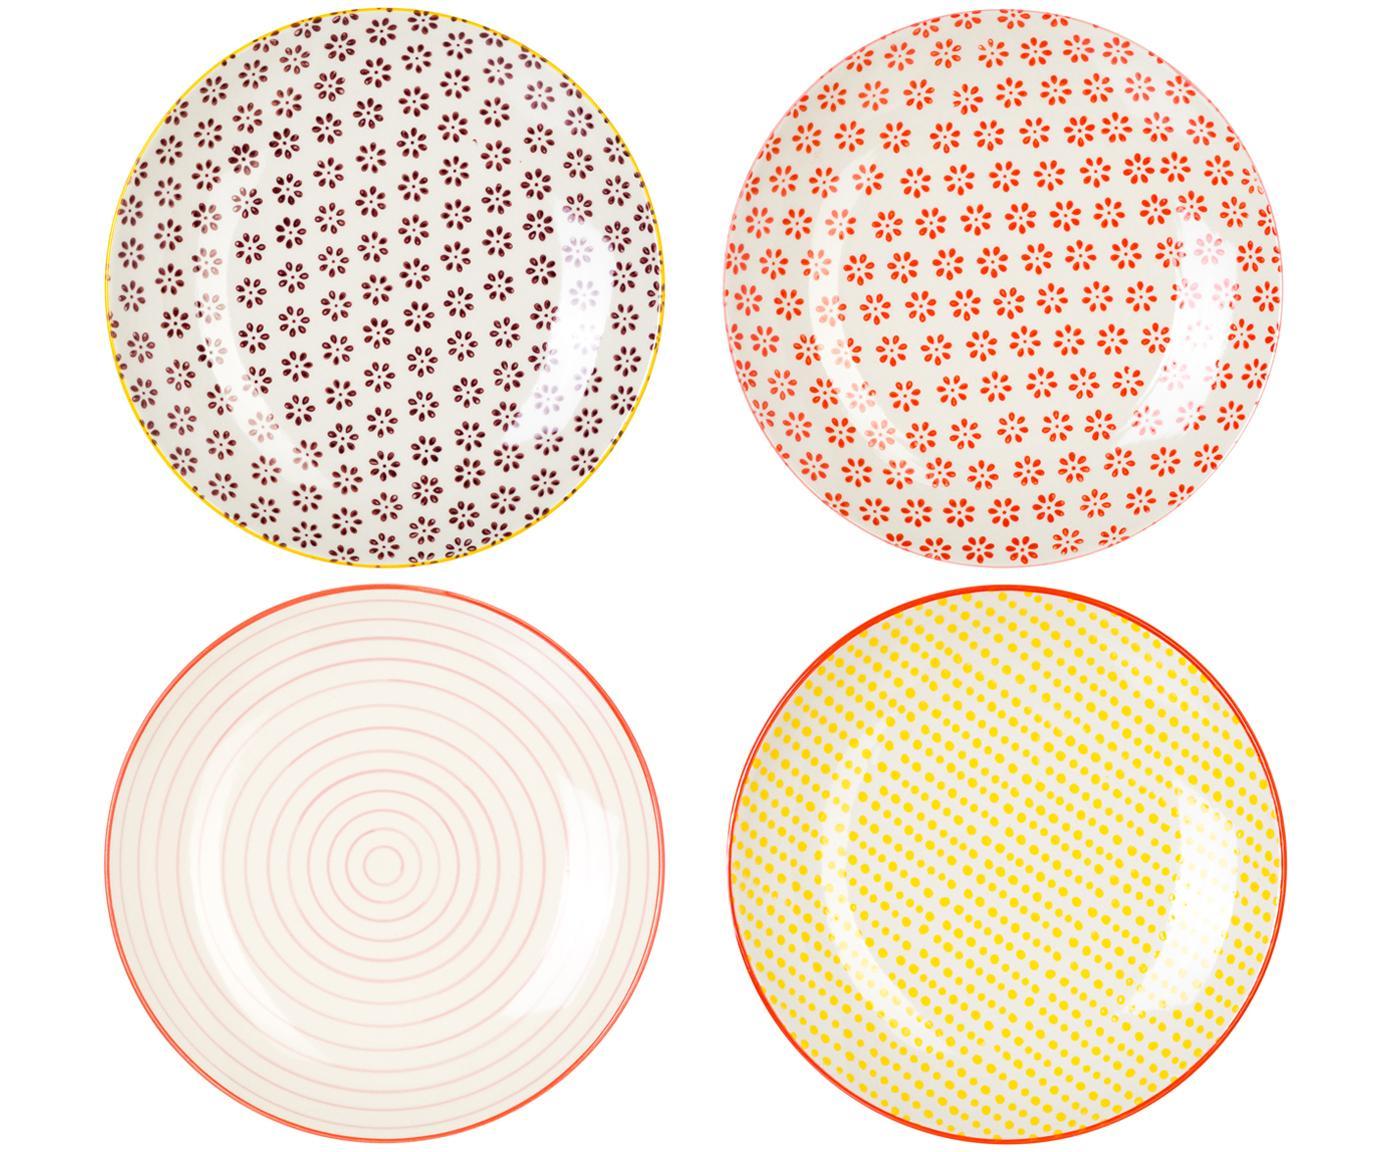 Frühstücksteller-Set Susie, 4-tlg., Steingut, Mehrfarbig, Ø 20 cm